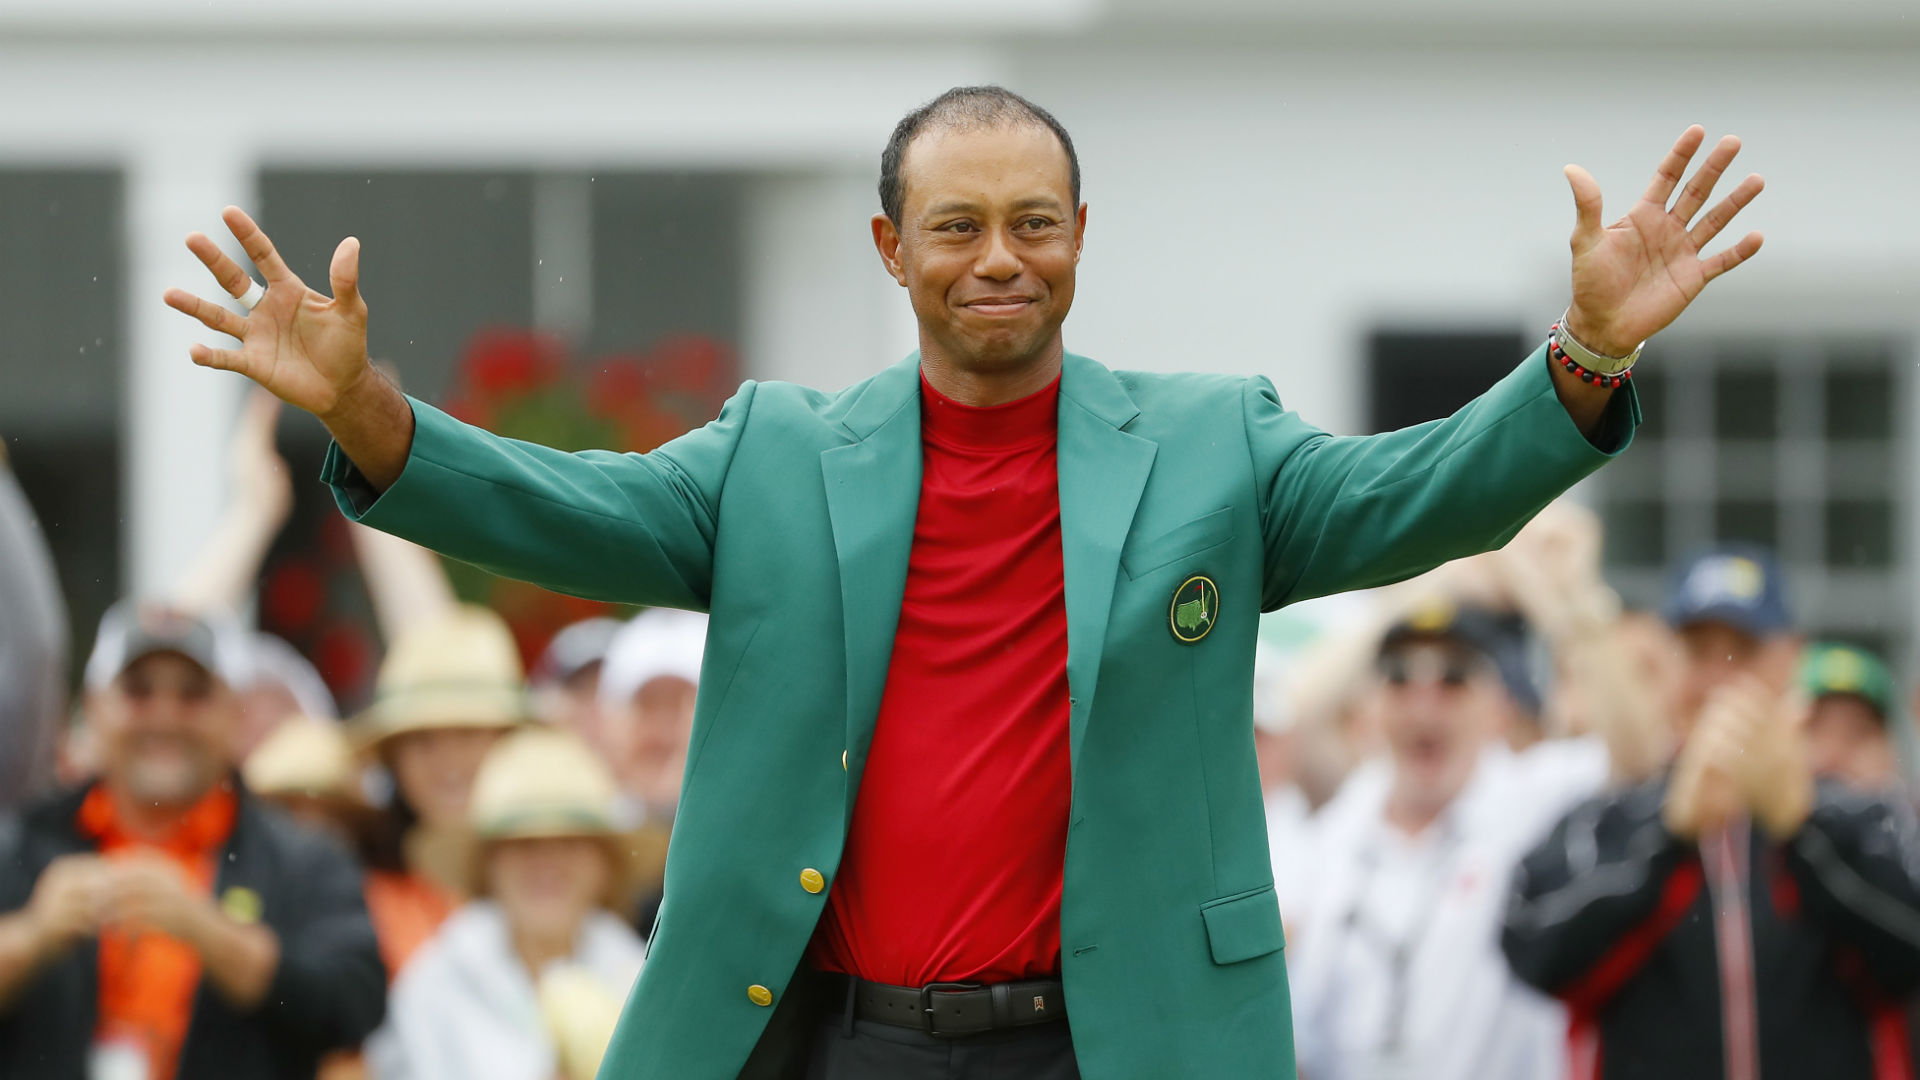 Debate: Can Tiger Woods overhaul Jack Nicklaus' major record?